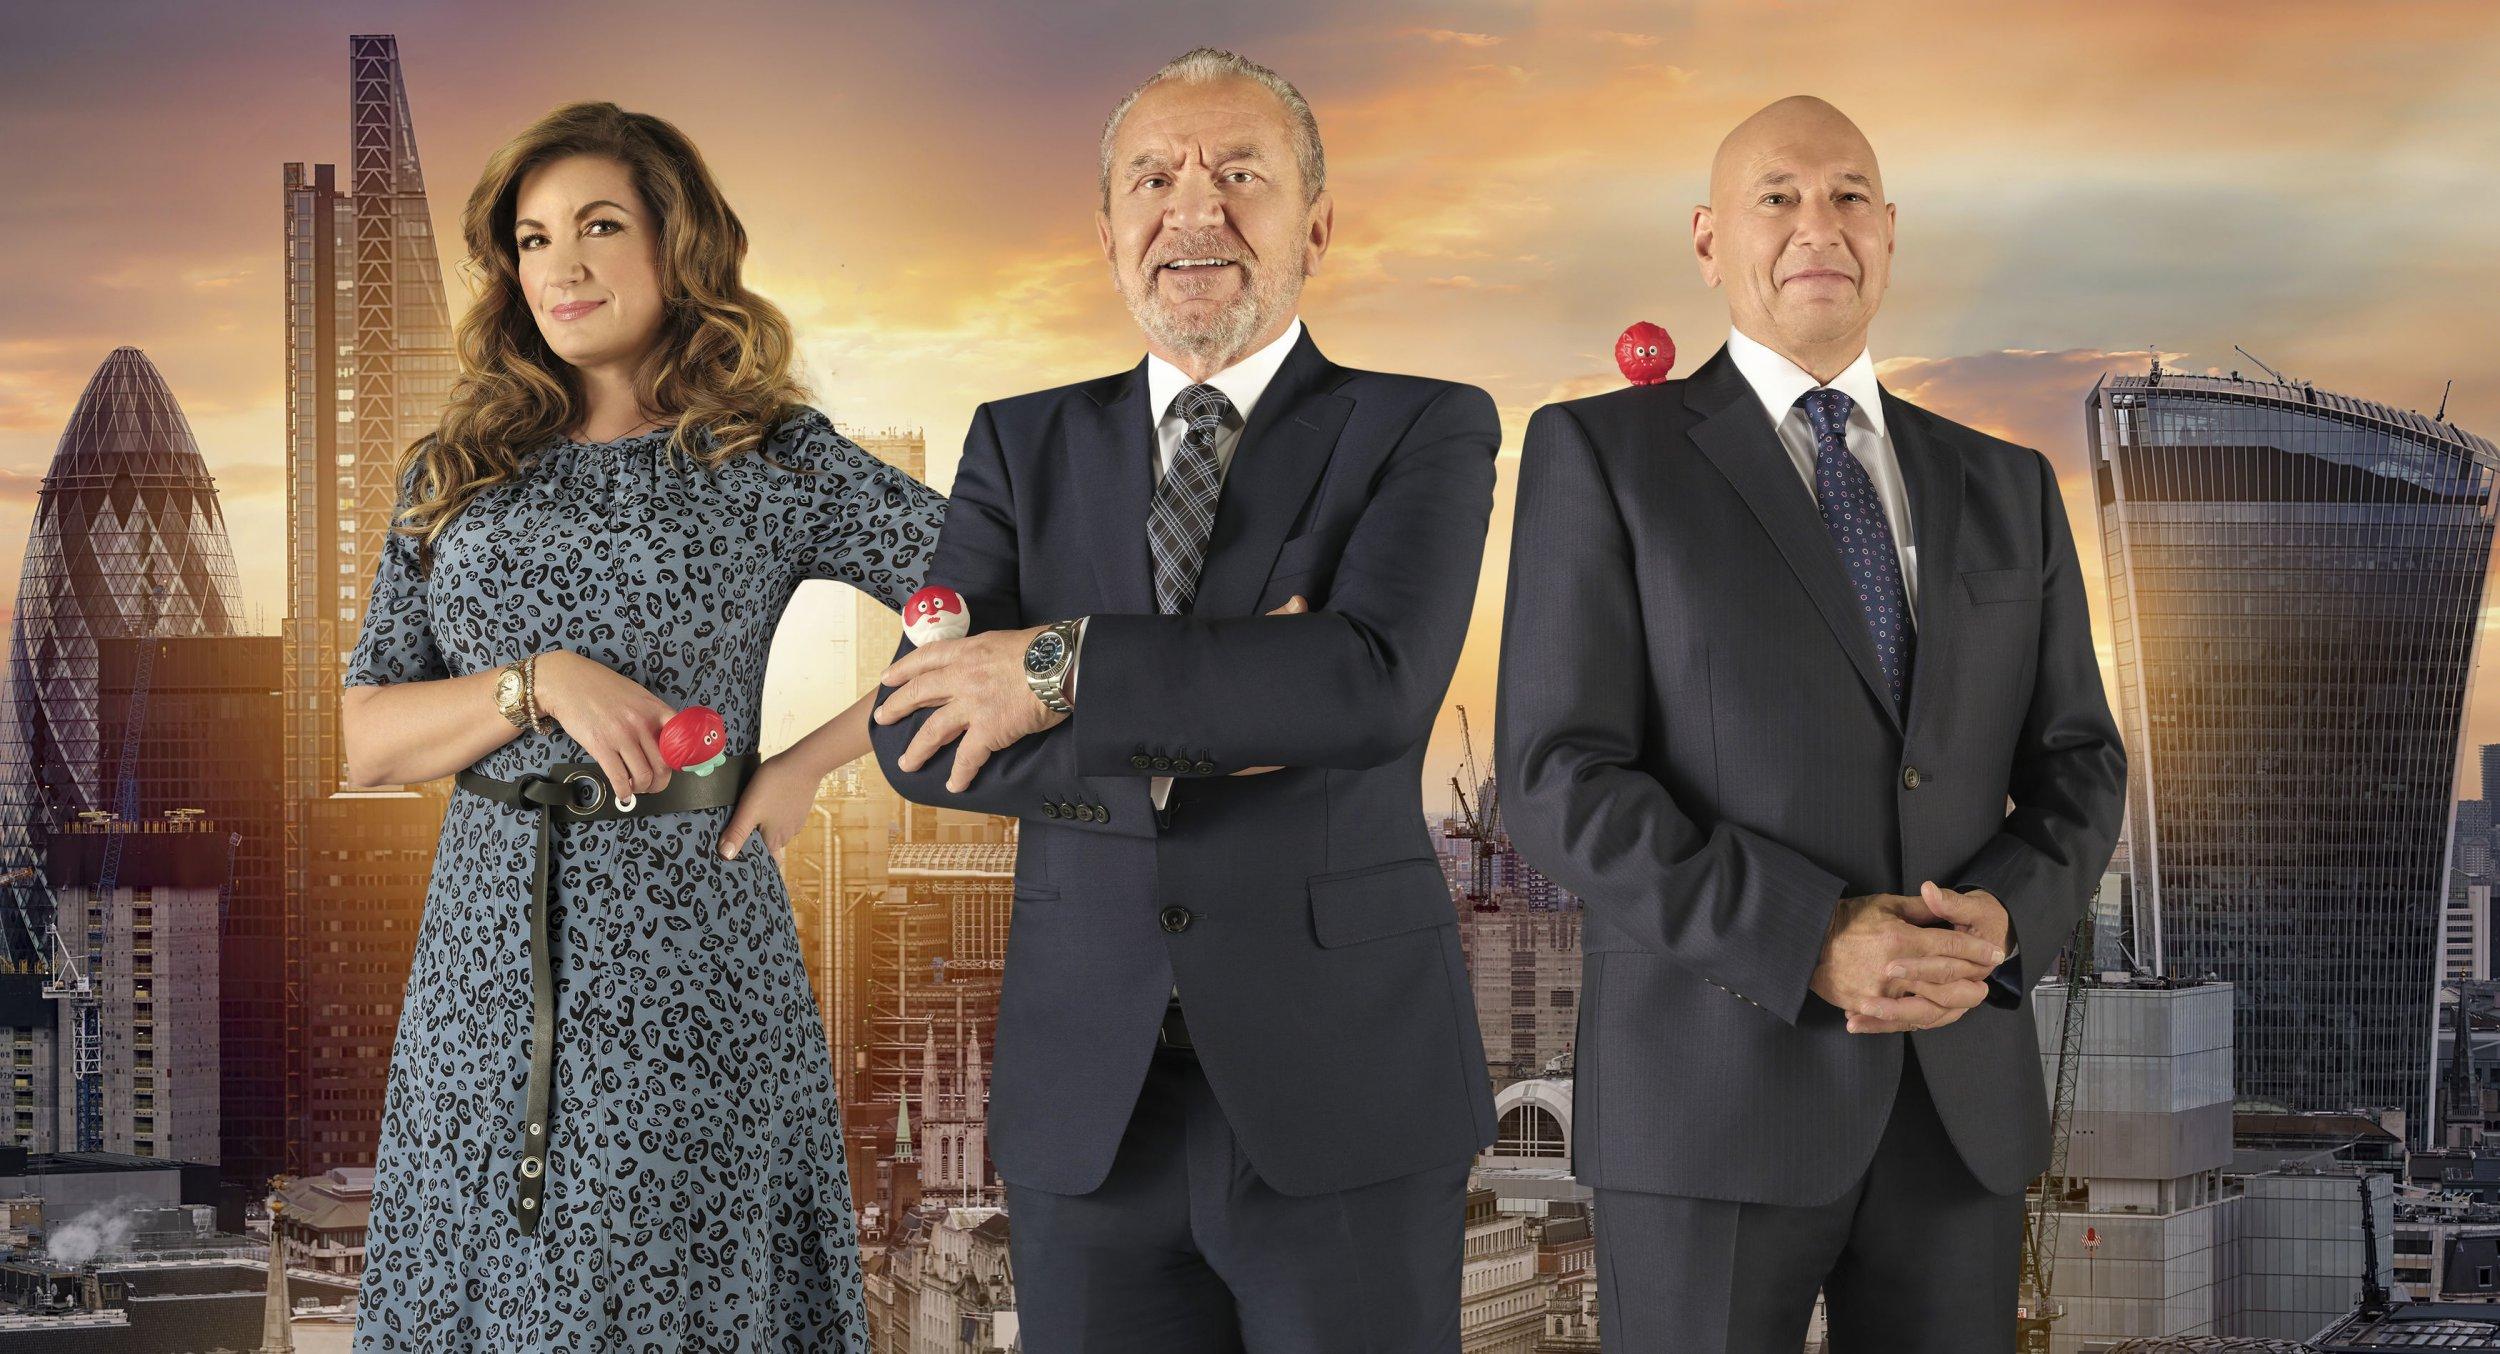 Karren Brady, Lord Sugar and Claude Littner in Celebrity Apprentice